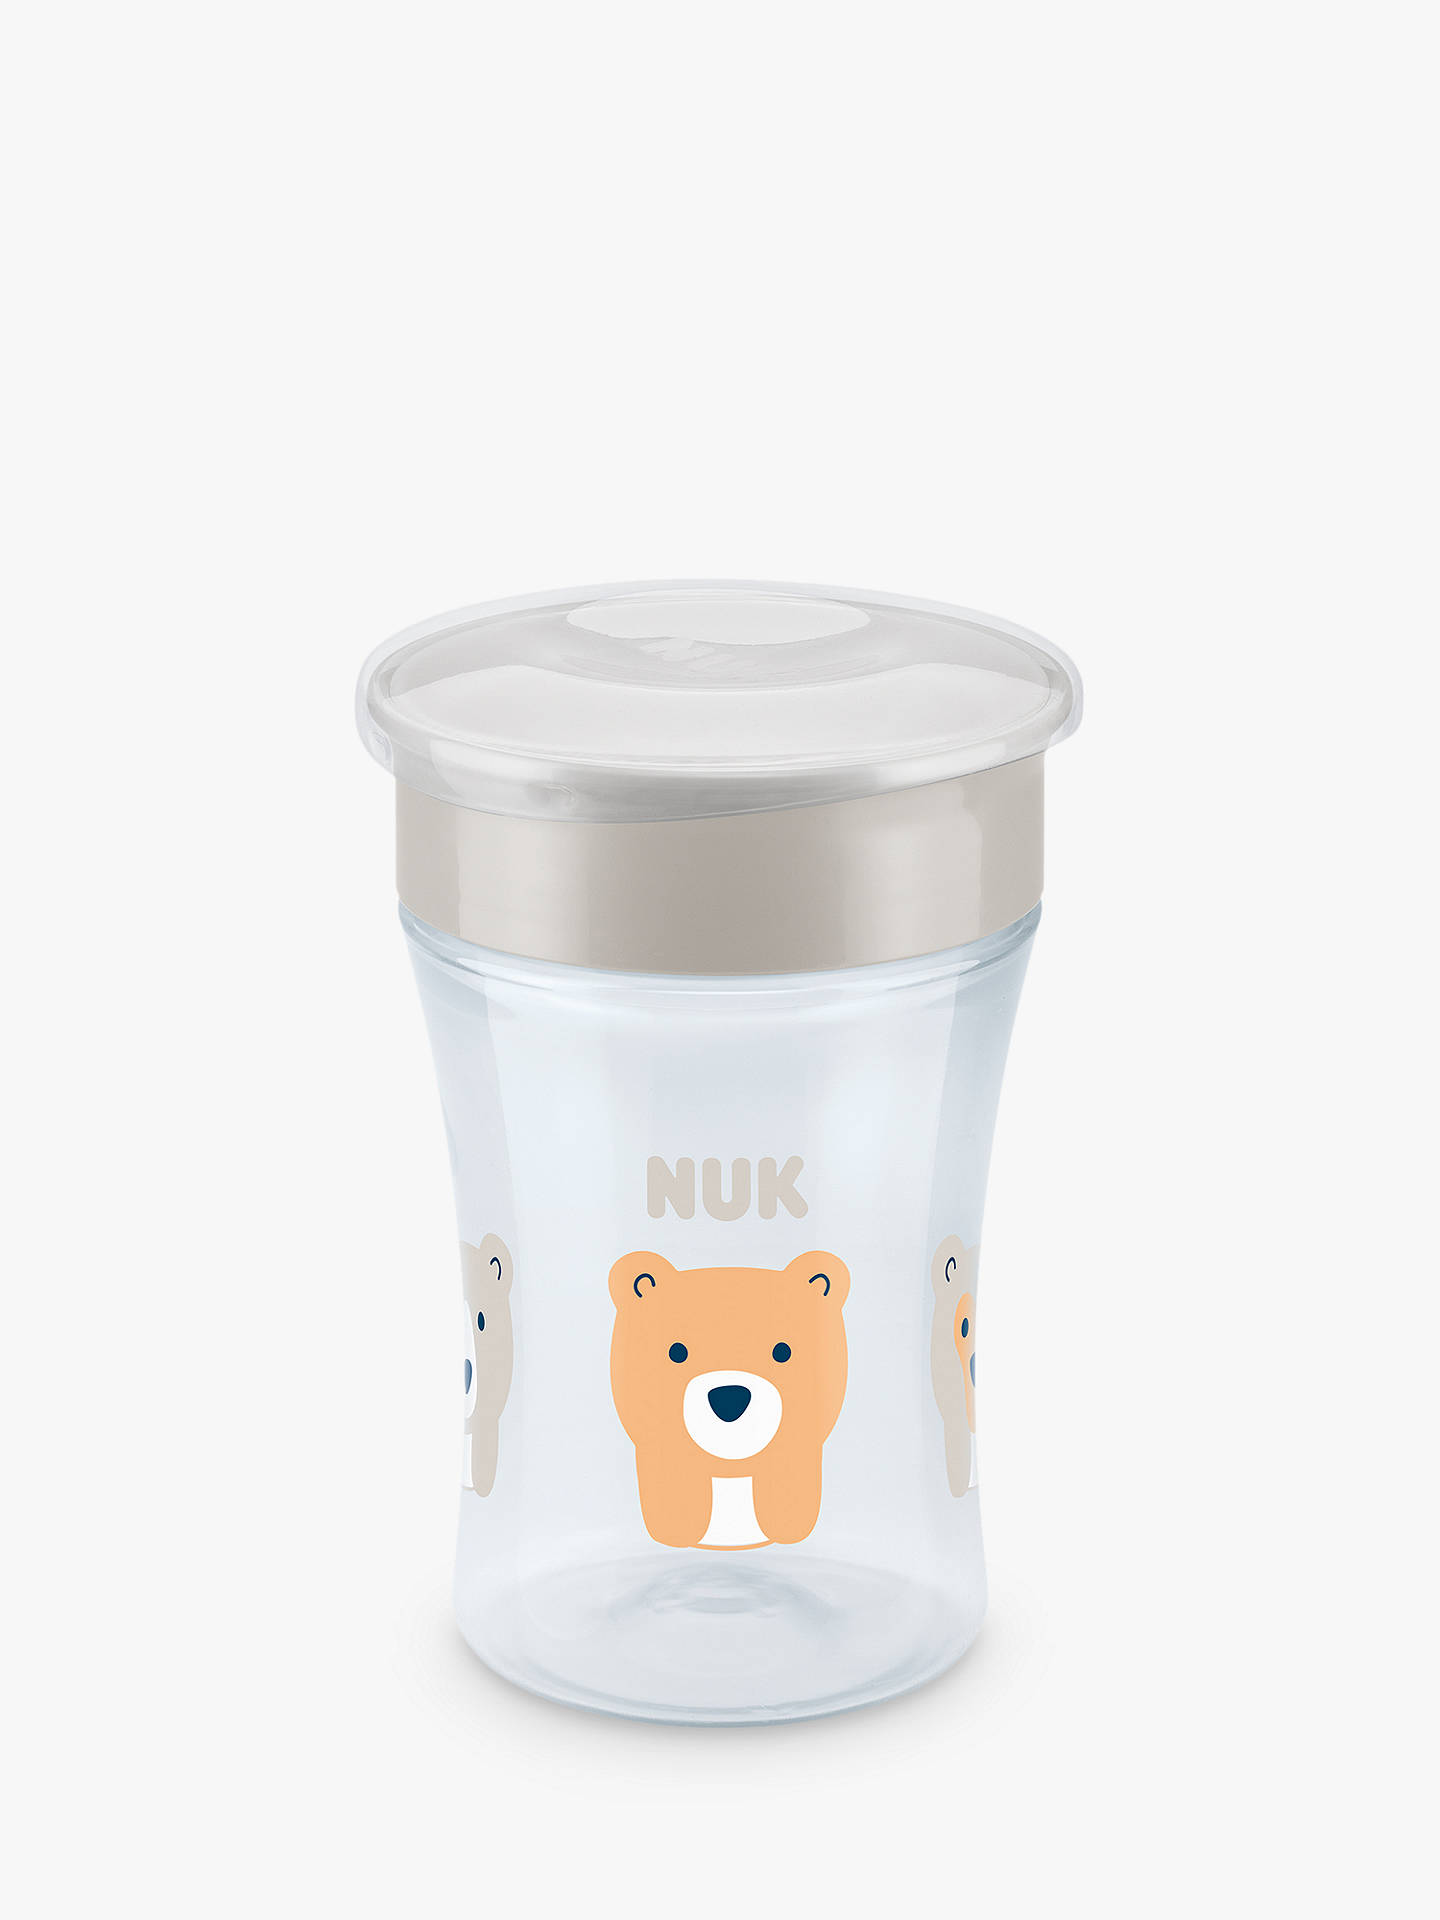 NUK Evolution Magic Cup, White